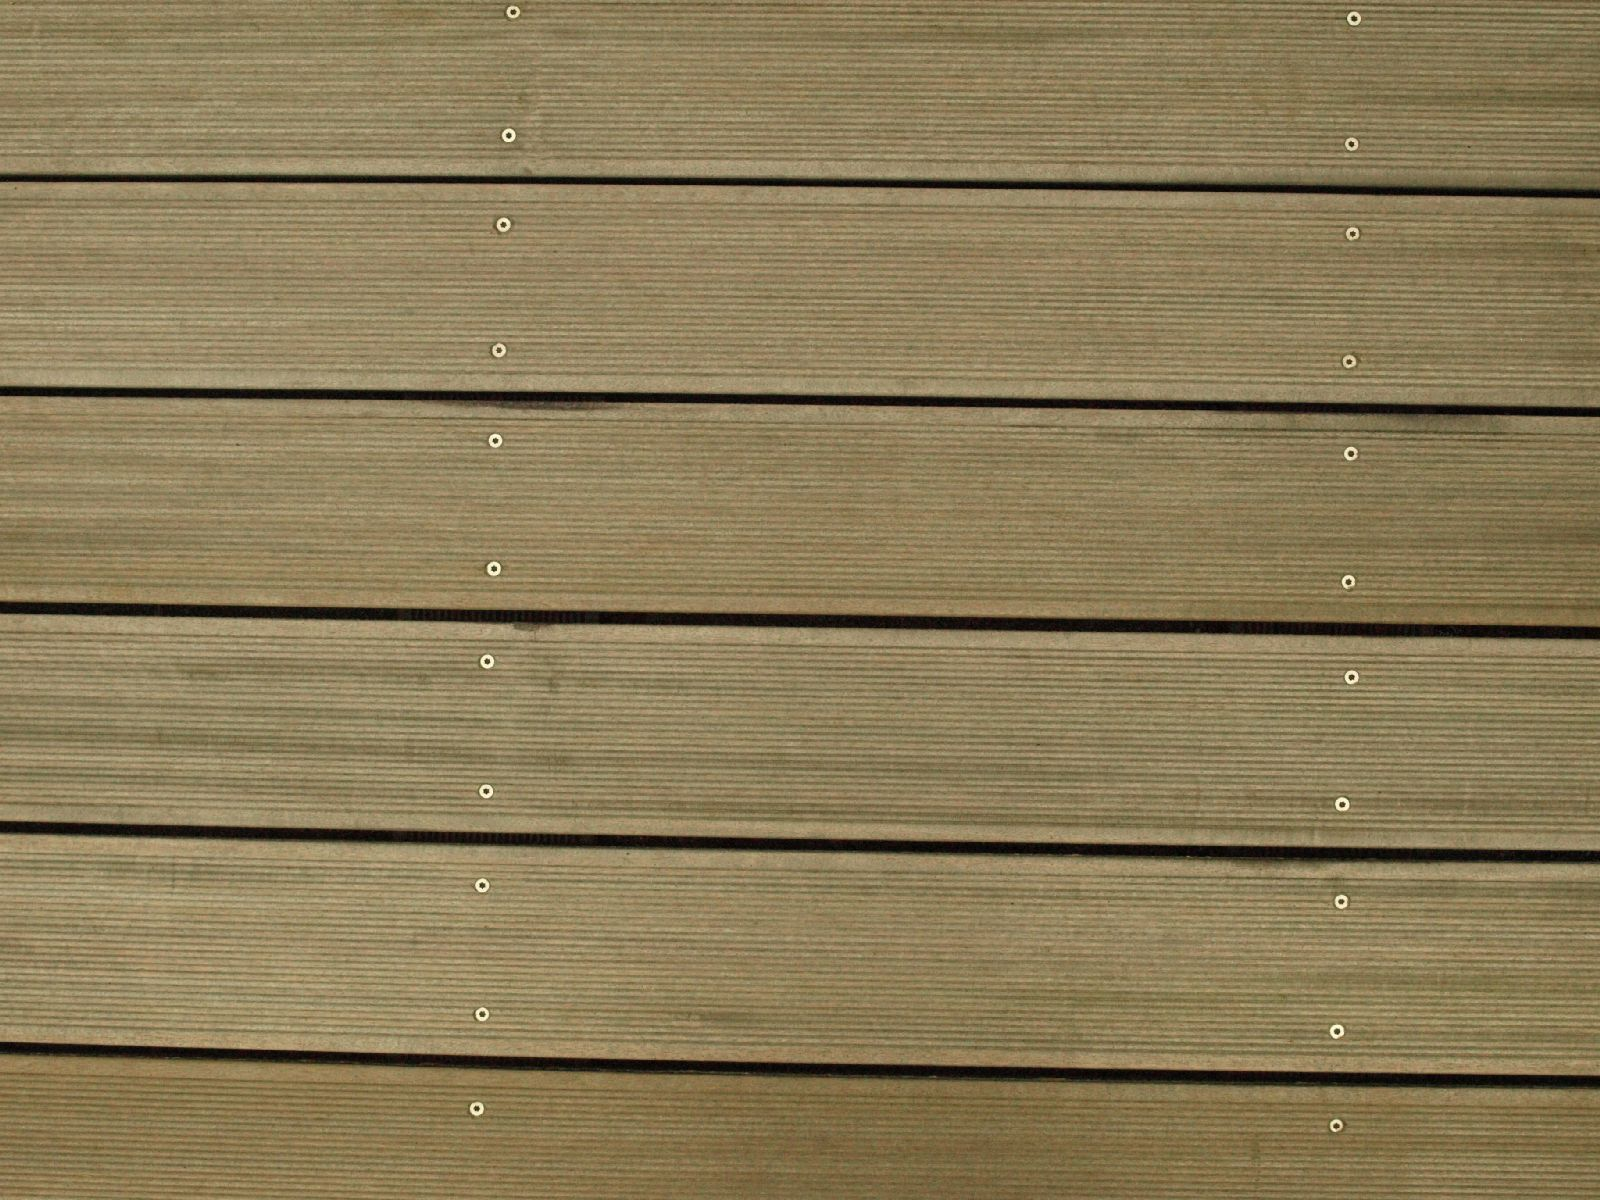 Wood_Texture_A_P4091735